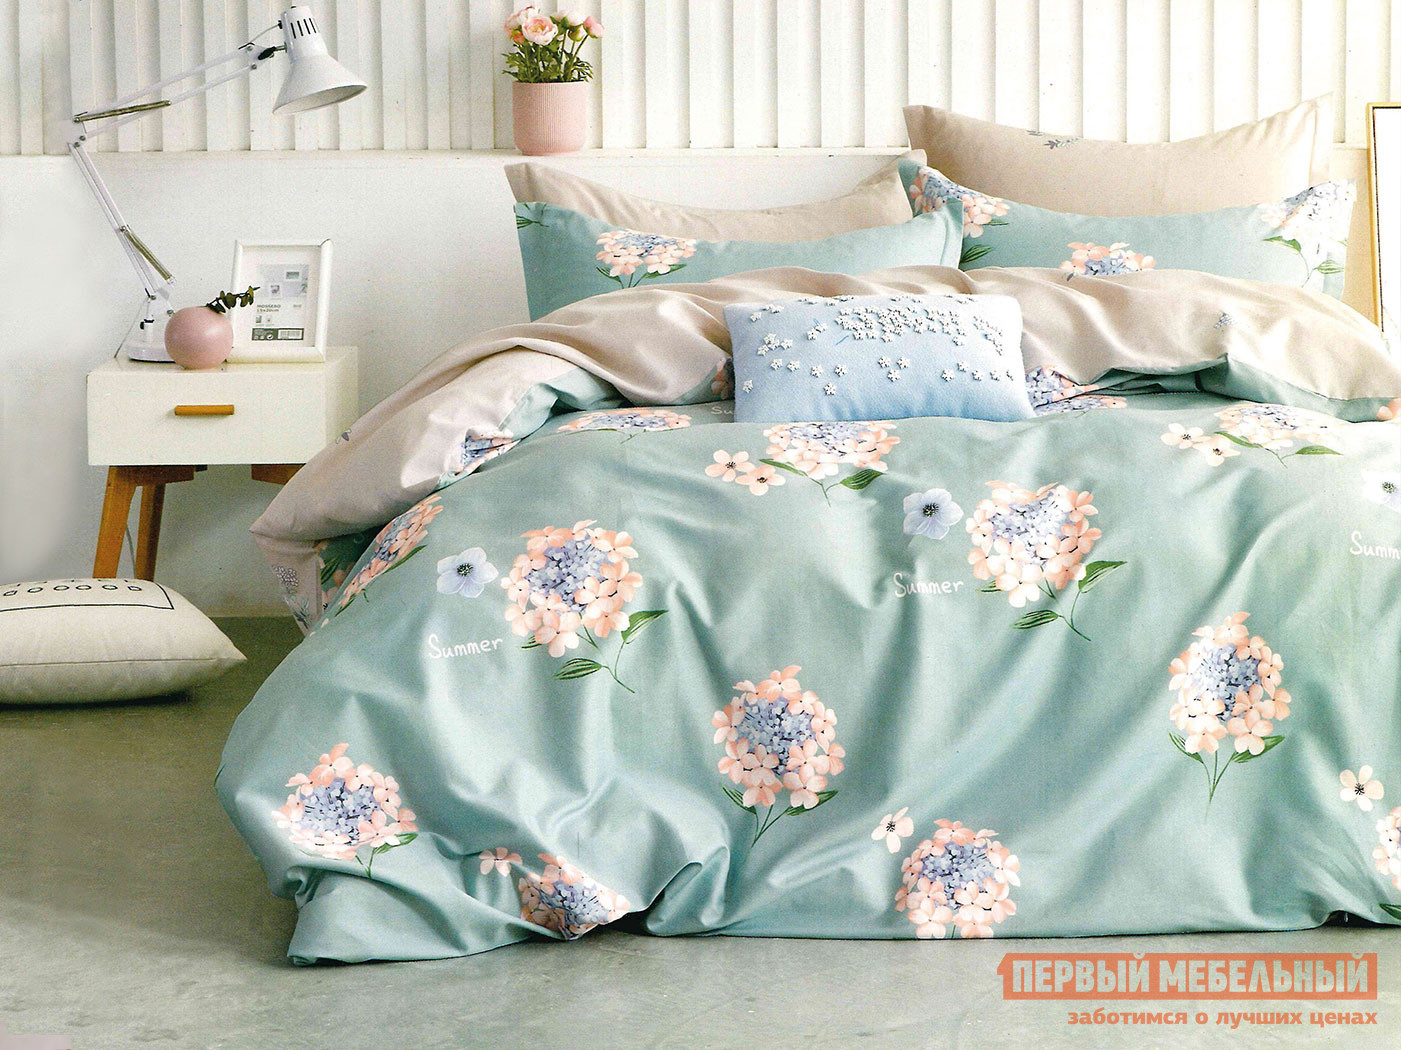 Комплект постельного белья КПБ Butterfly Сатин 3040 3040, сатин, Евро фото